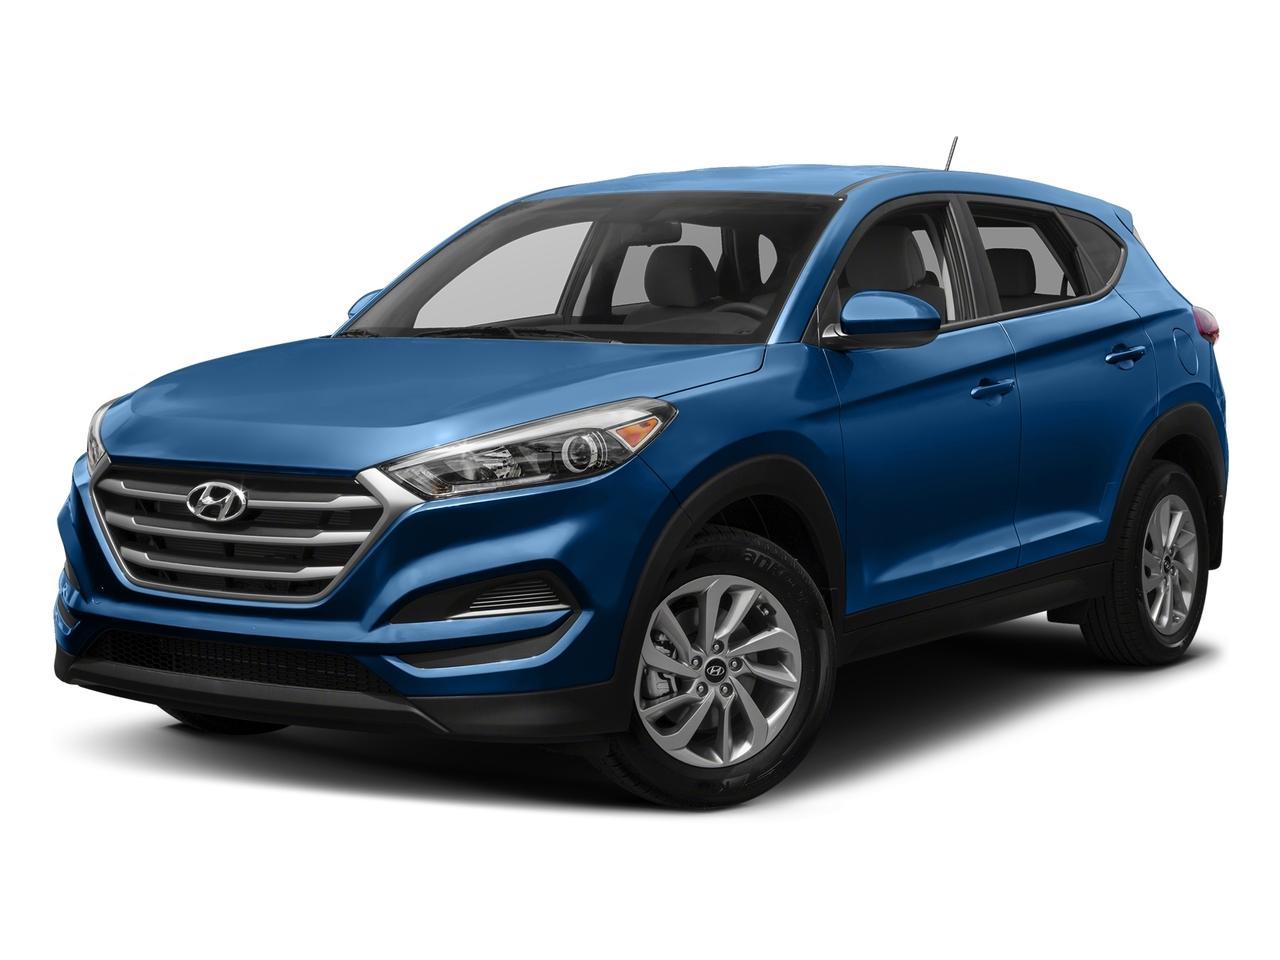 2017 Hyundai Tucson Vehicle Photo in Tucson, AZ 85712